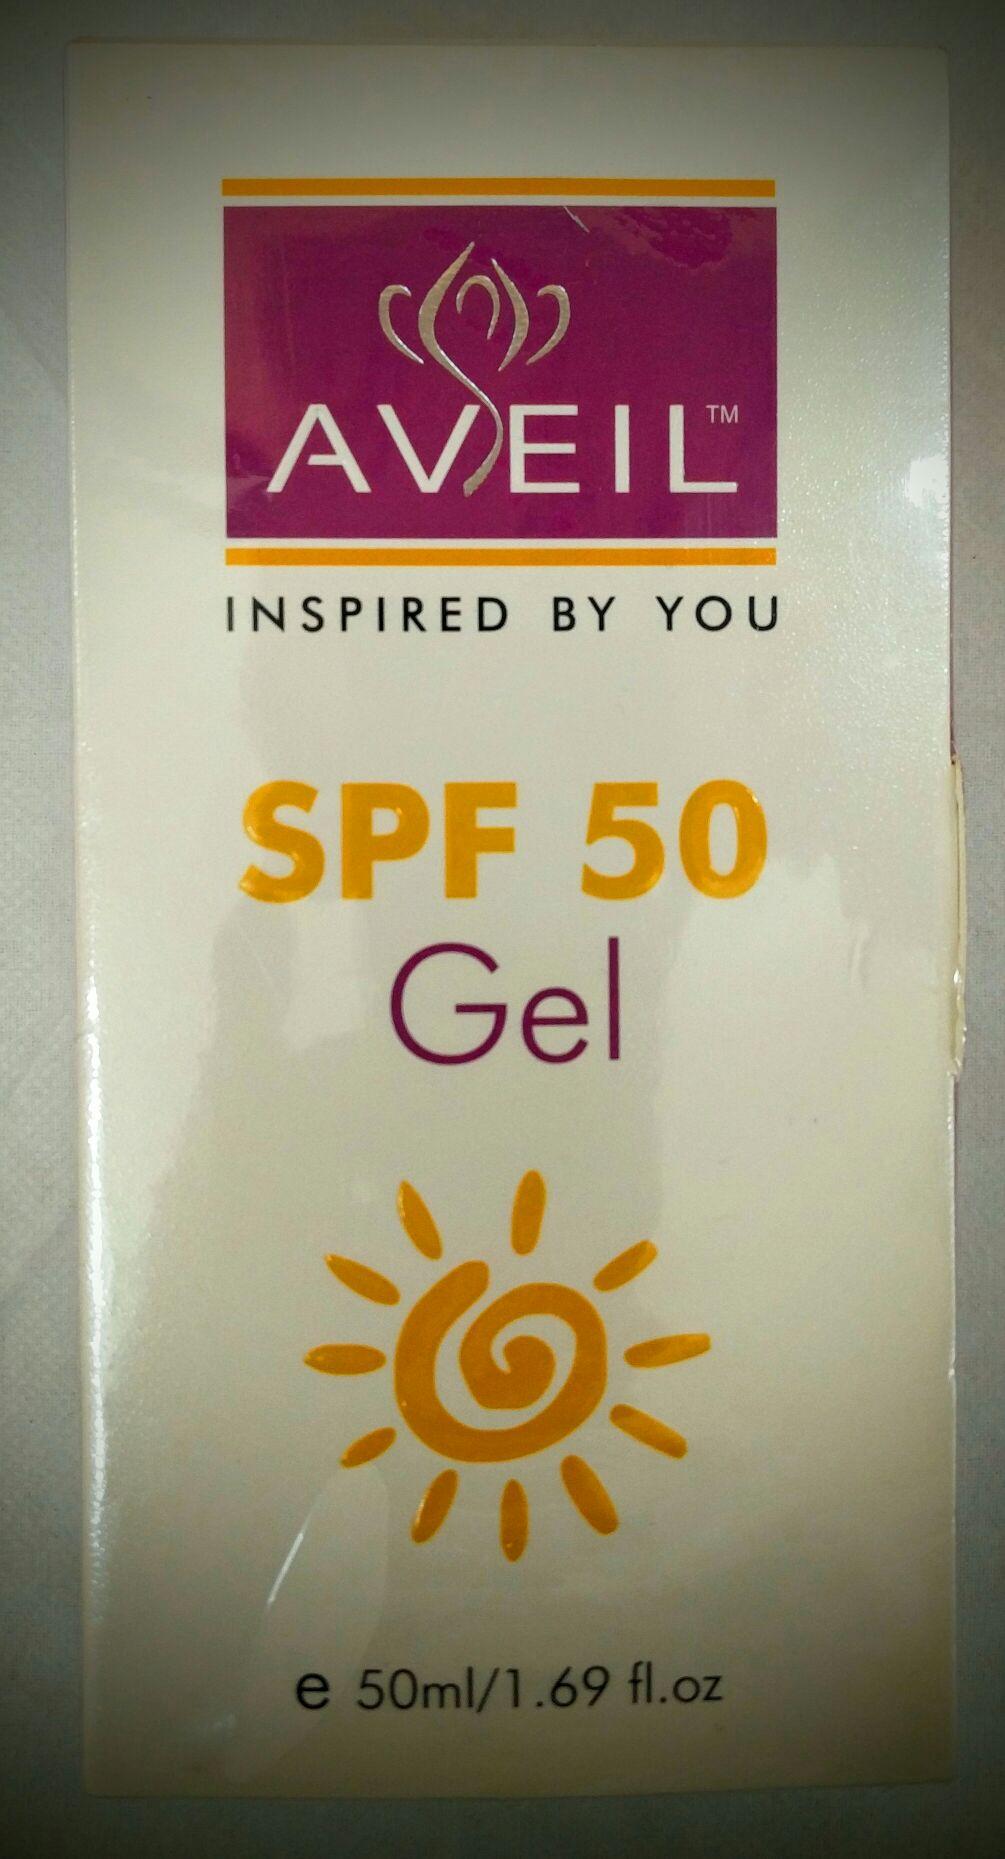 Aveil SPF 50 Gel